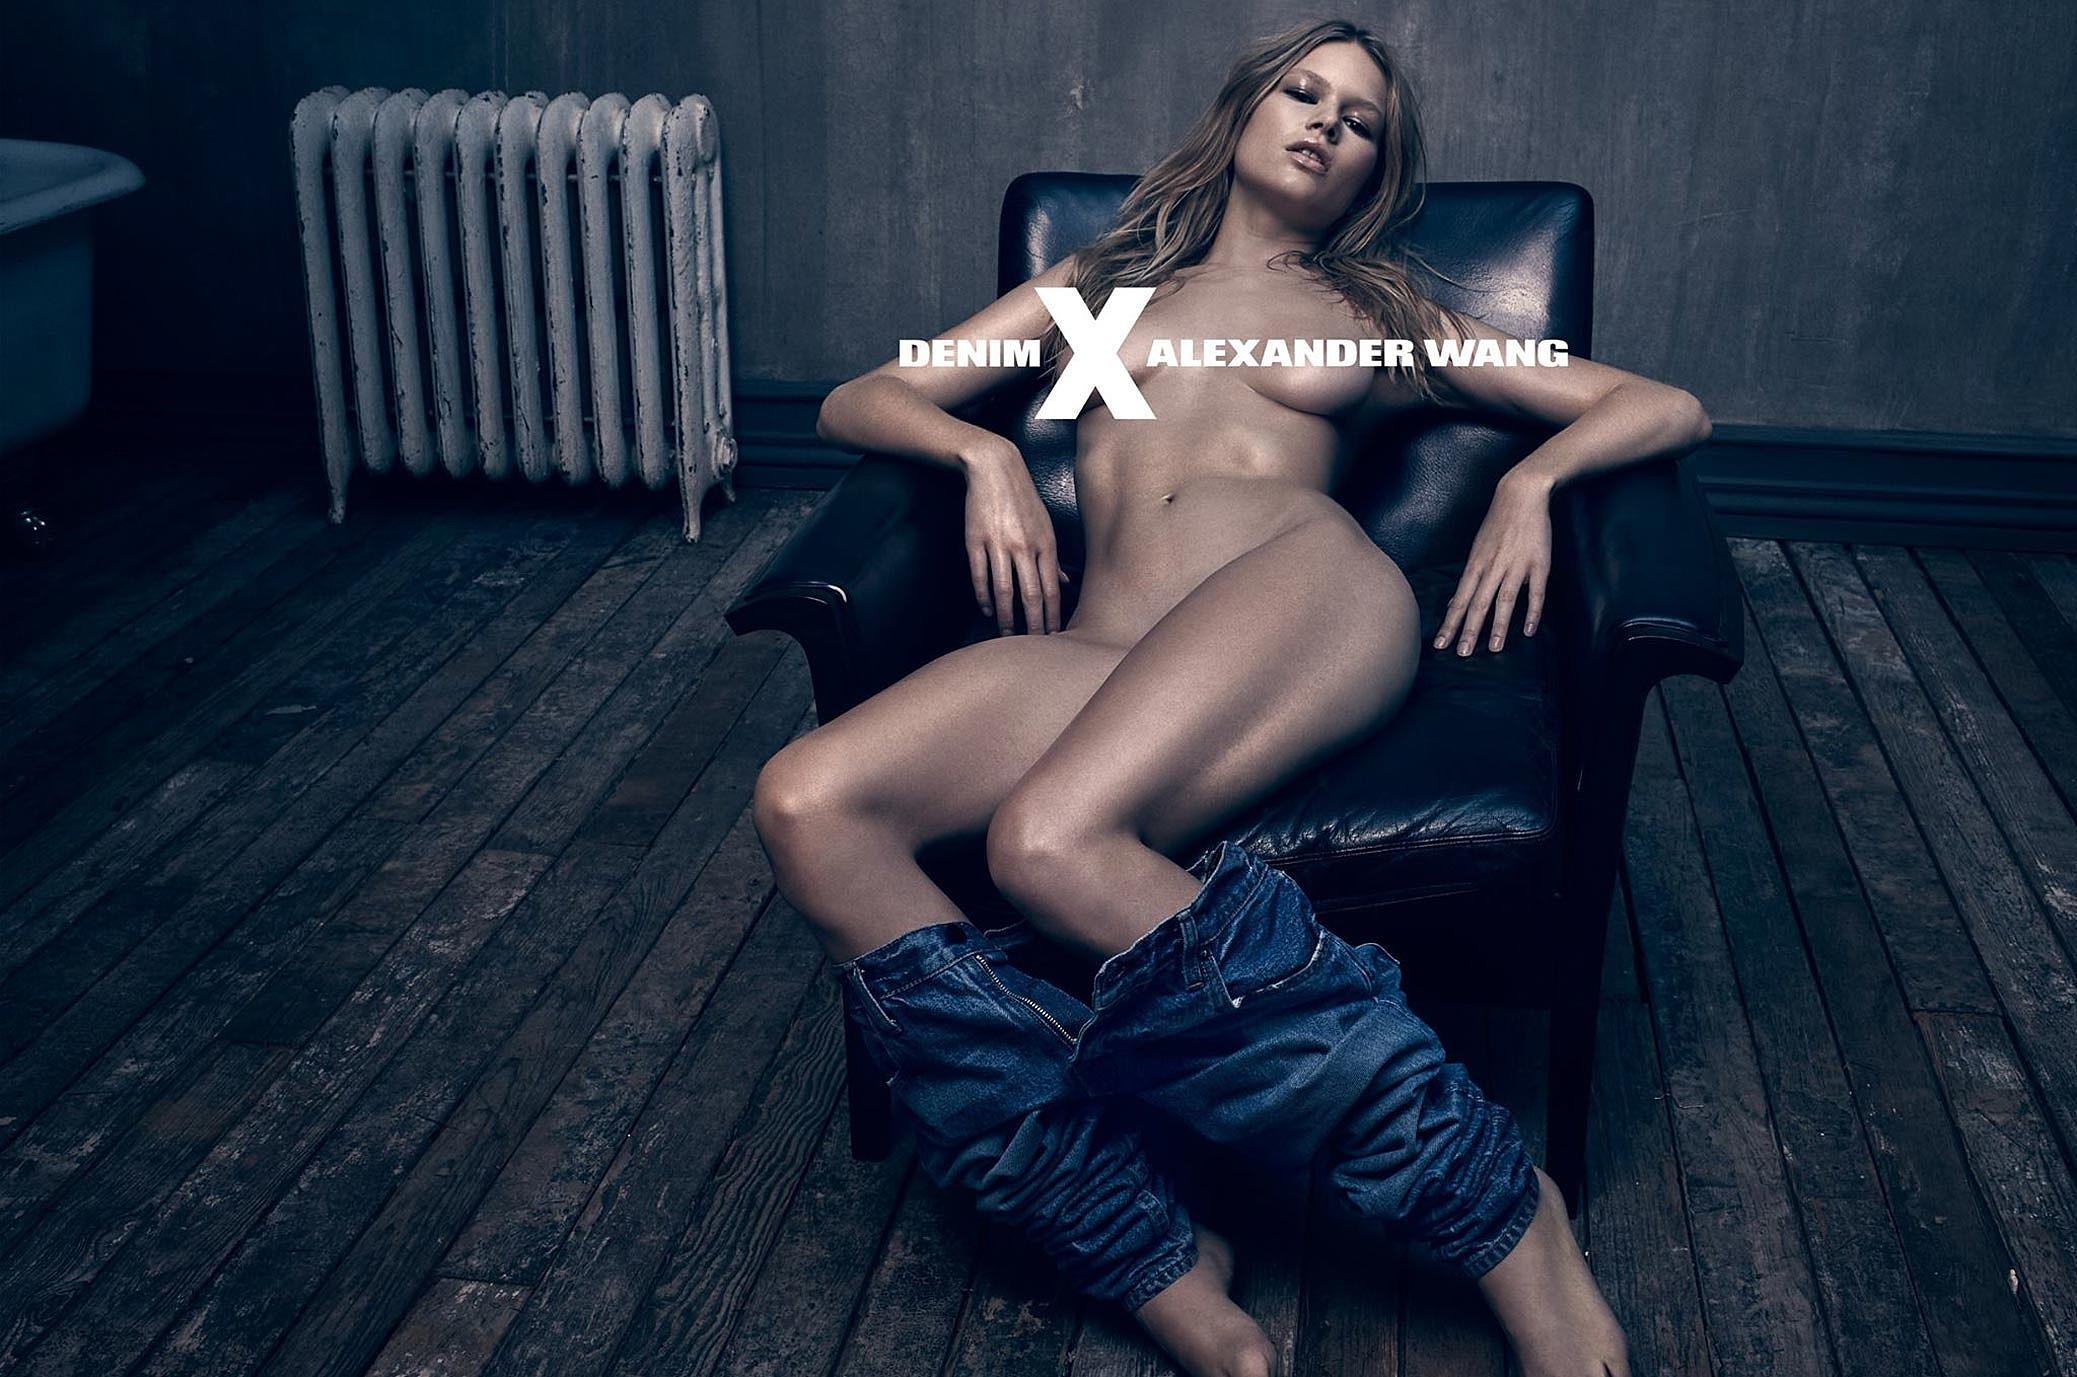 Секс в кампания фото 22 фотография